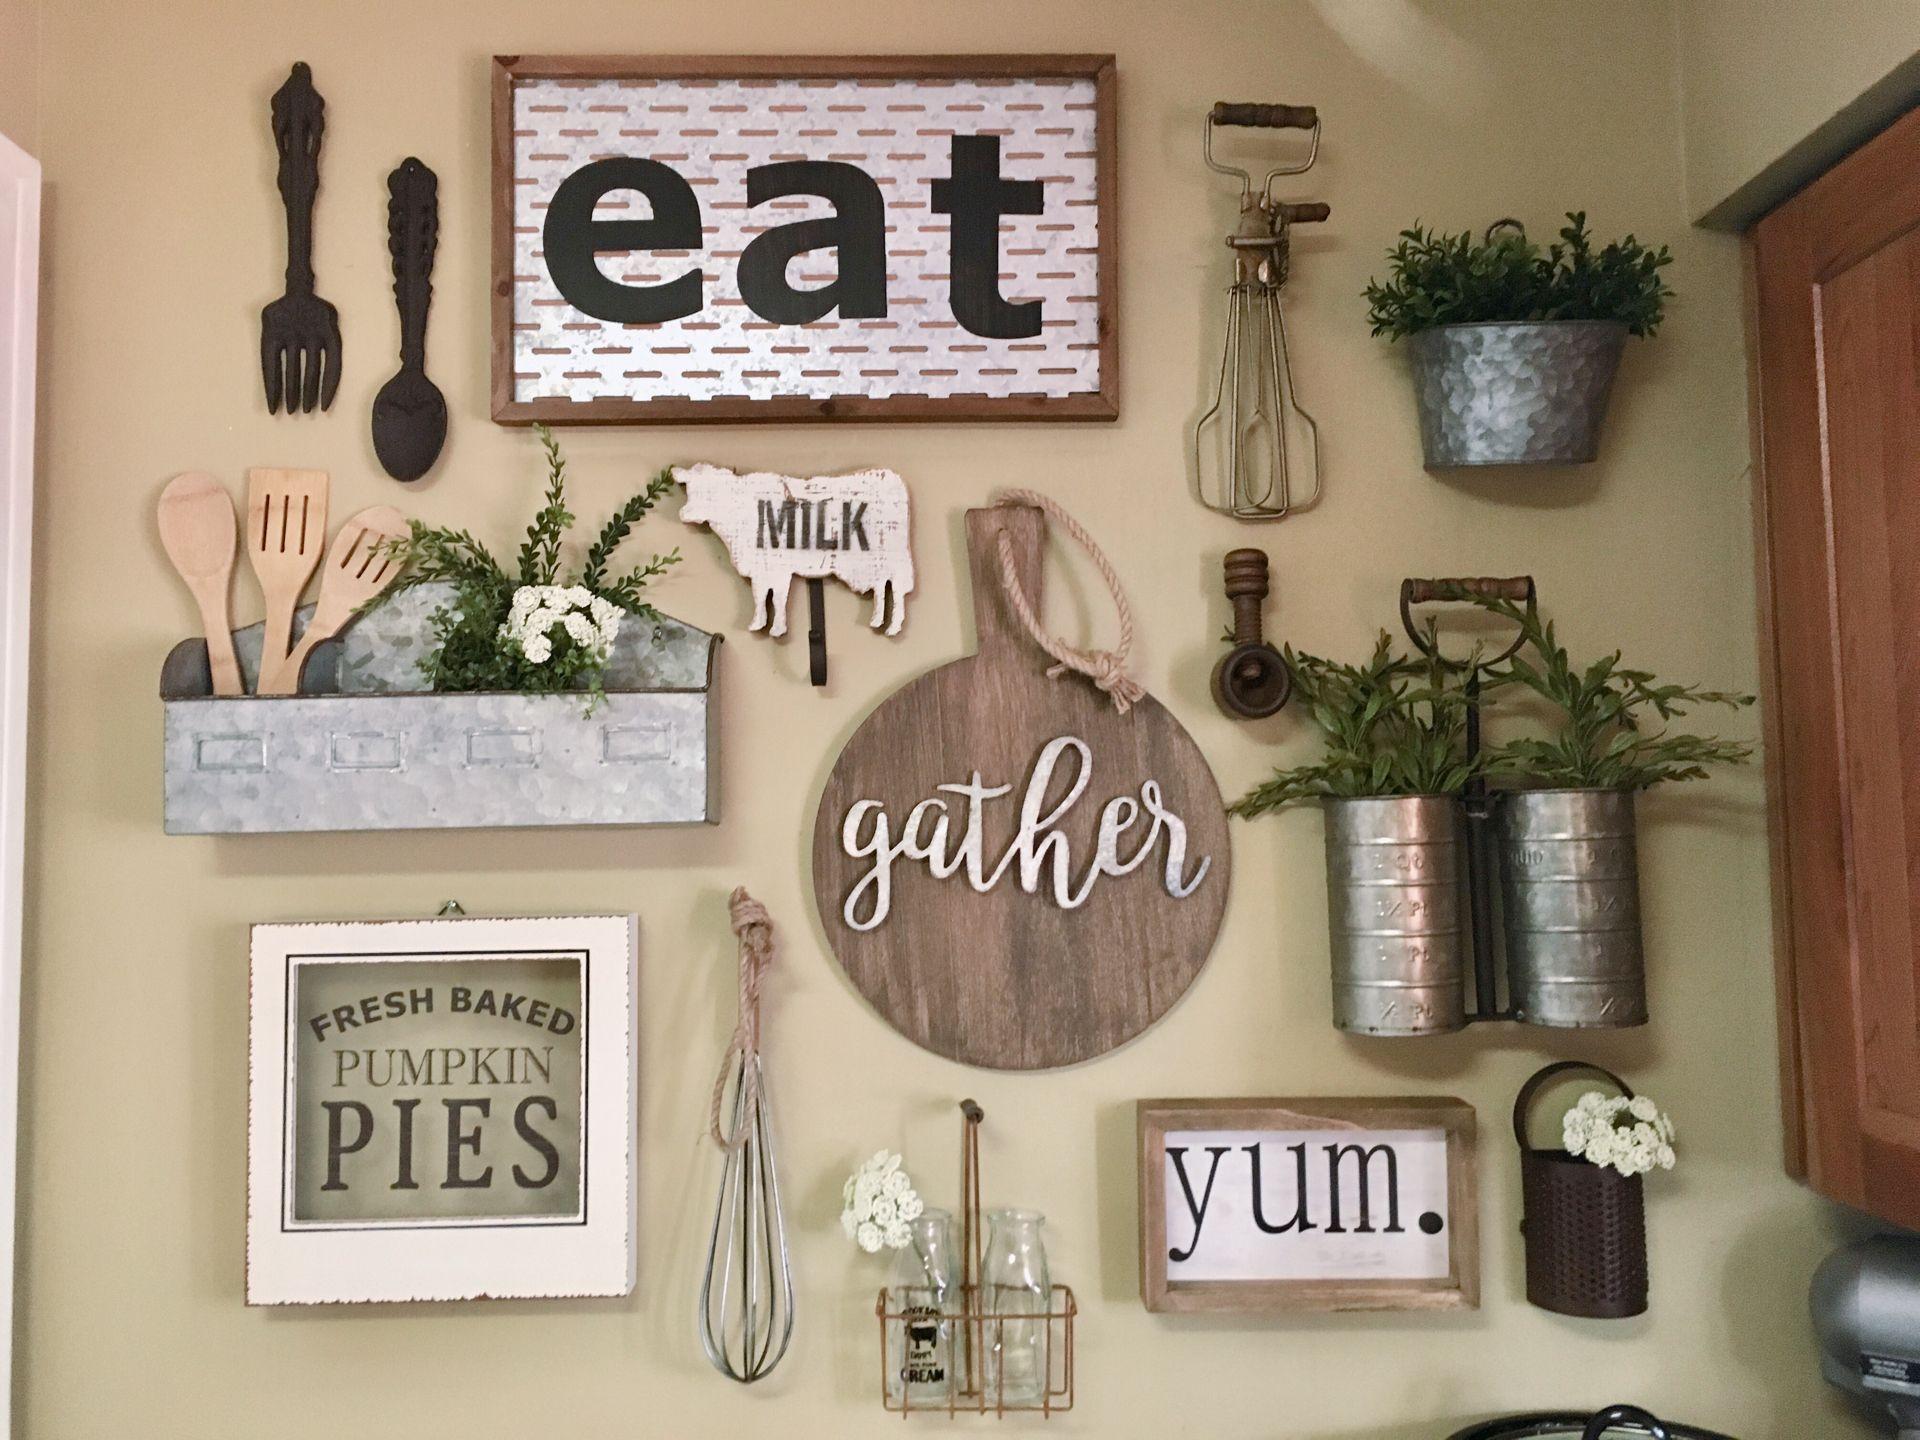 35+ Best Farmhouse Kitchen Decor Ideas to Fuel Your